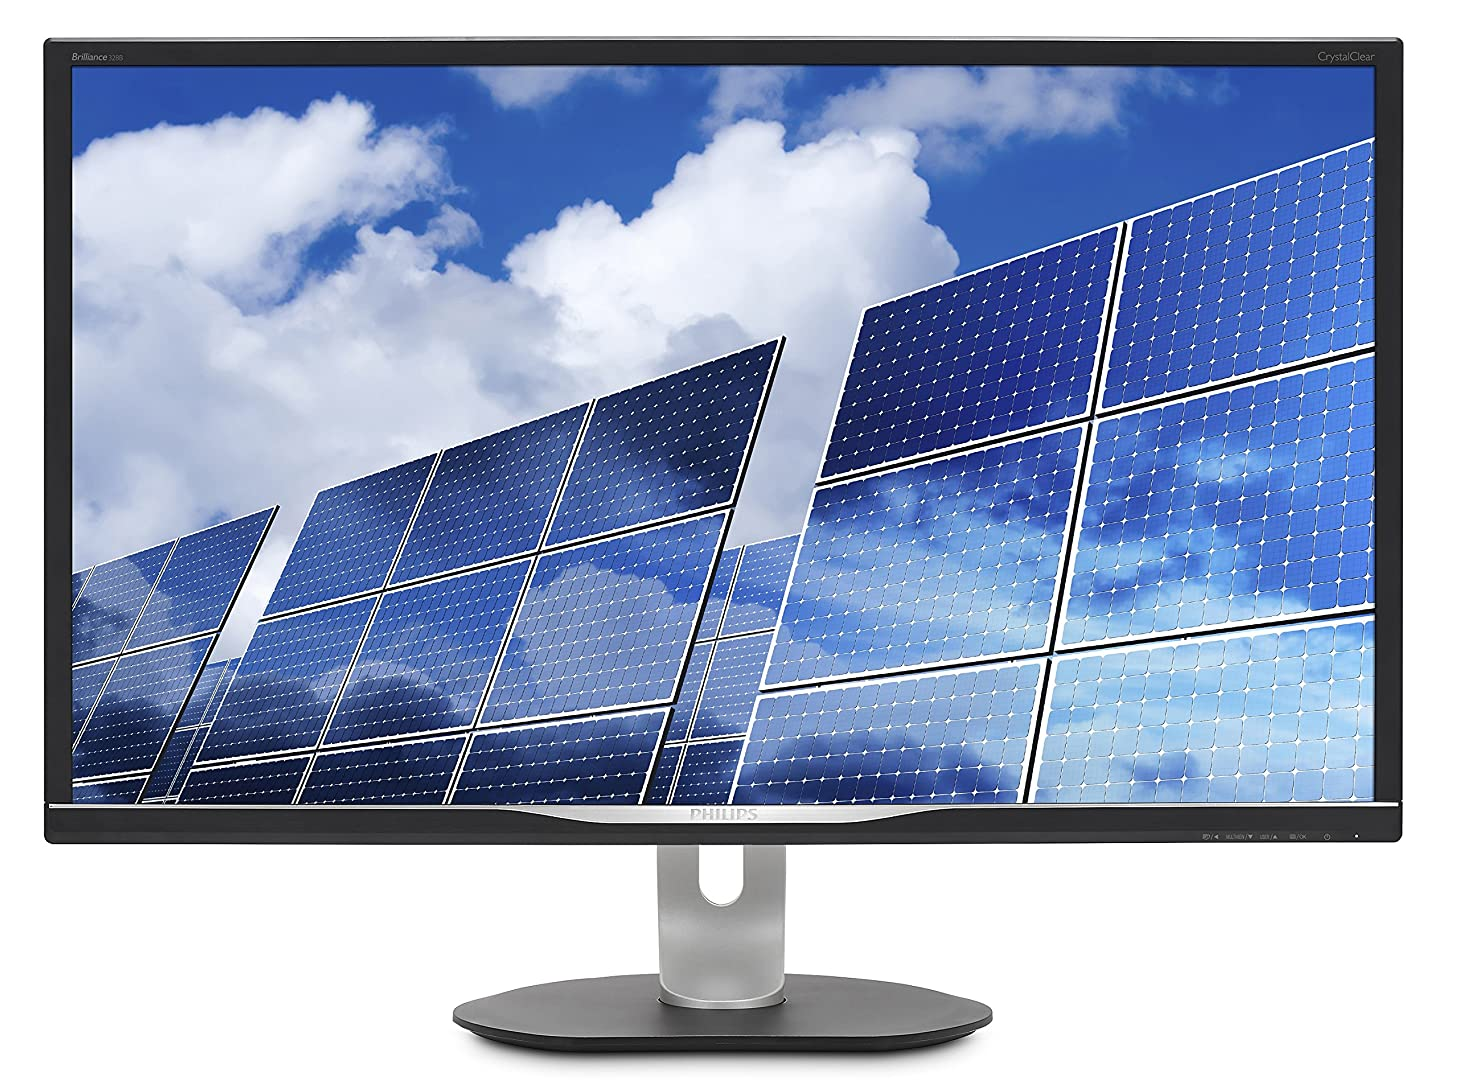 "Philips 328B6QJEB 32"" LCD Monitor, IPS Panel, 2560 x1440 Res, 60Hz, 5ms, VGA, DVI, HDMI, DP, Height/Pivot, Spkrs"